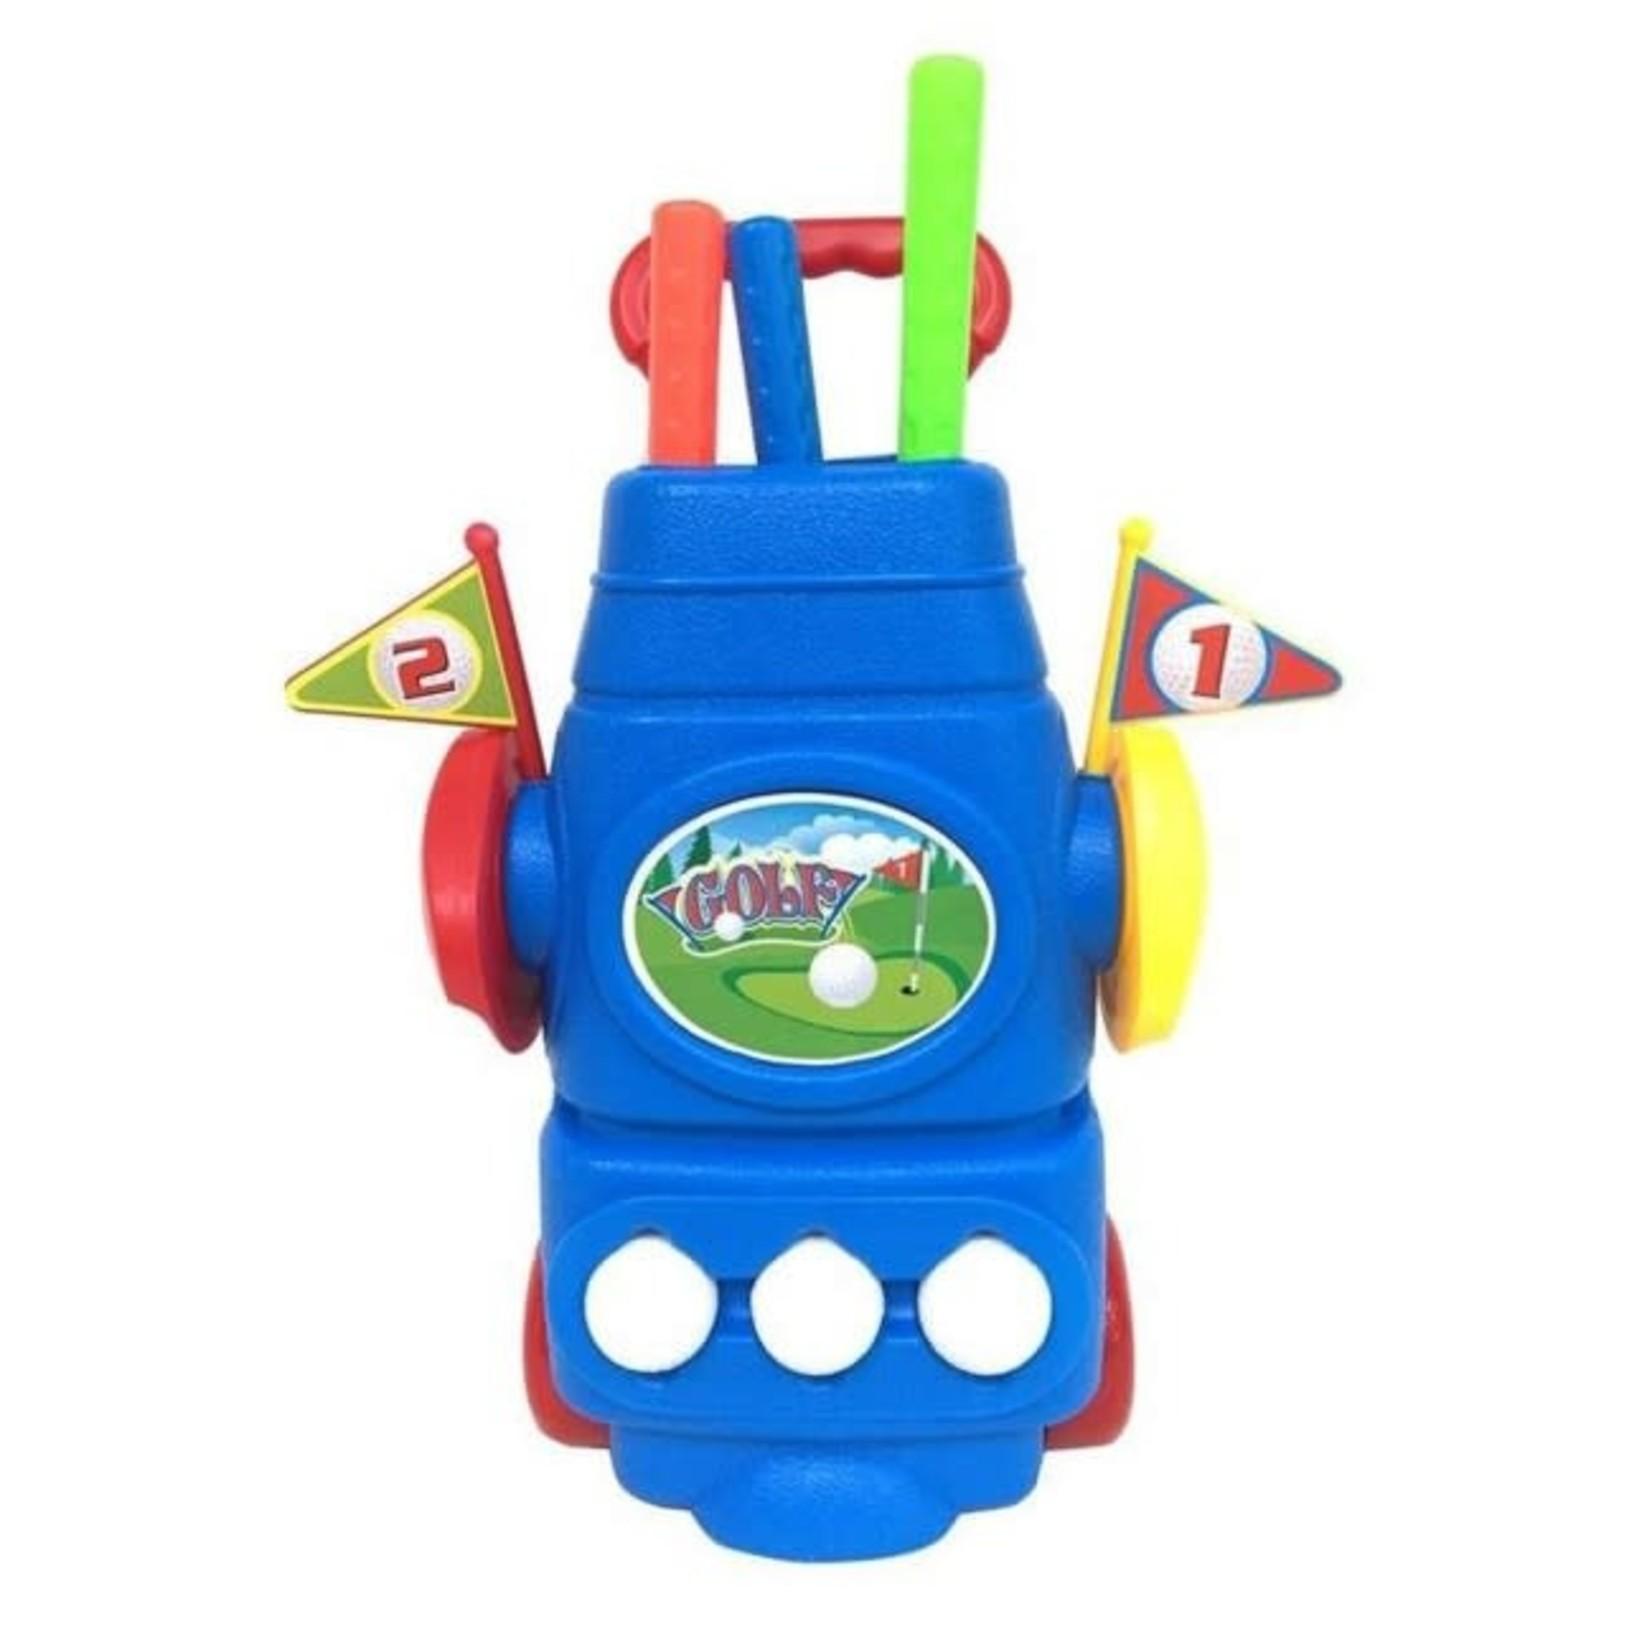 Golf Toy set 10pc